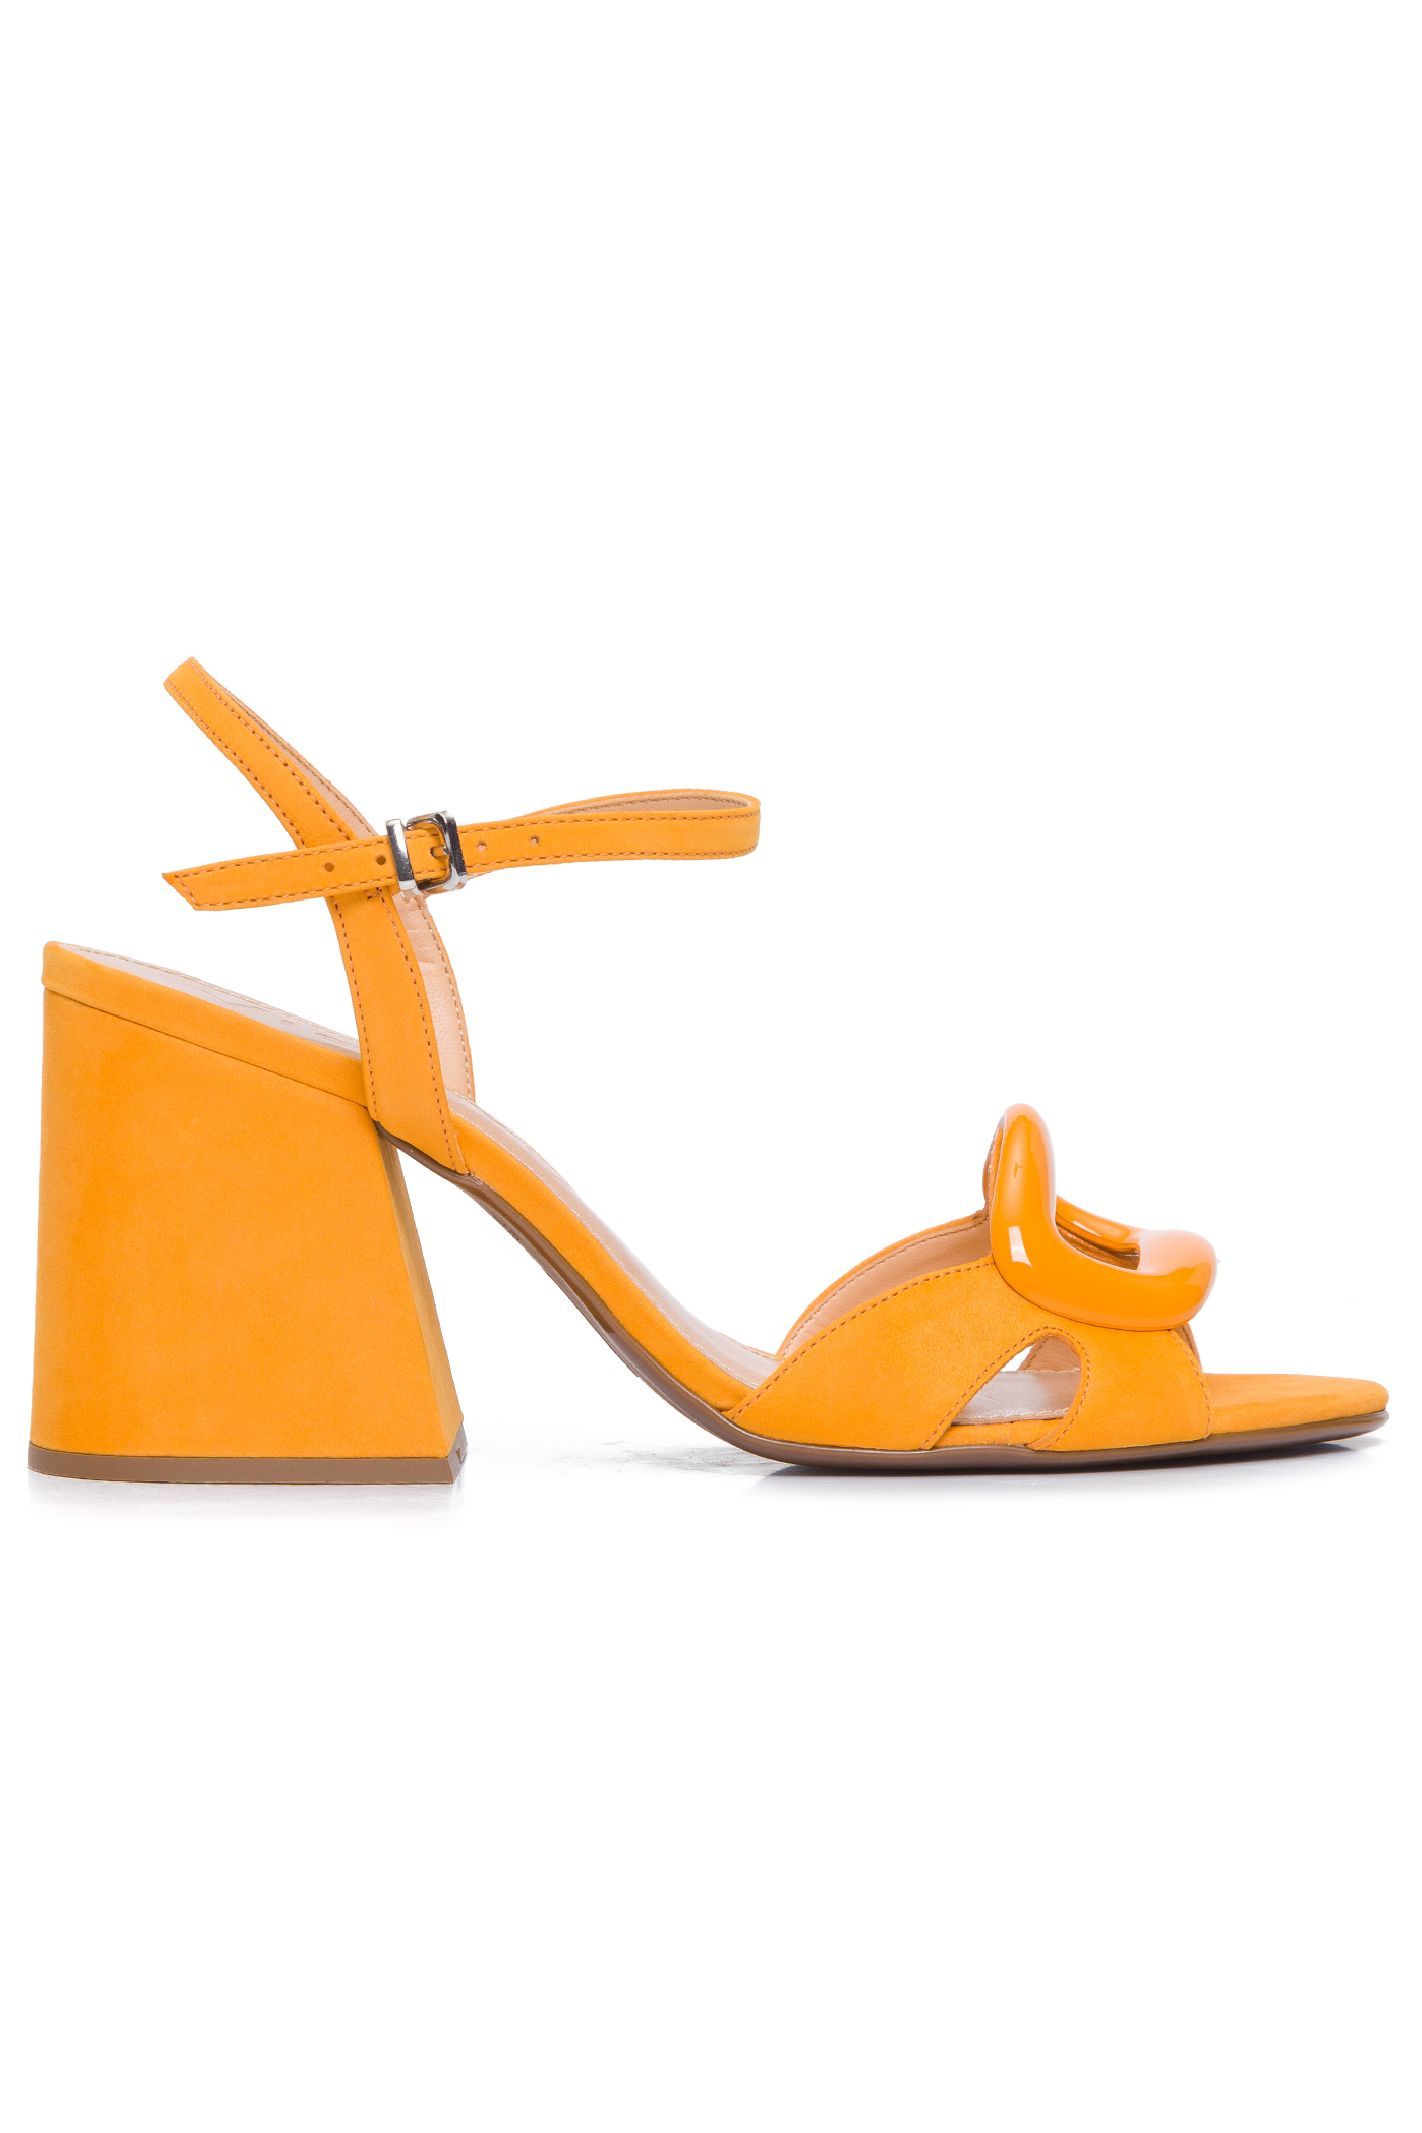 Sapato Lindo Salto Baixo | Sapato Feminino Giulia Domna